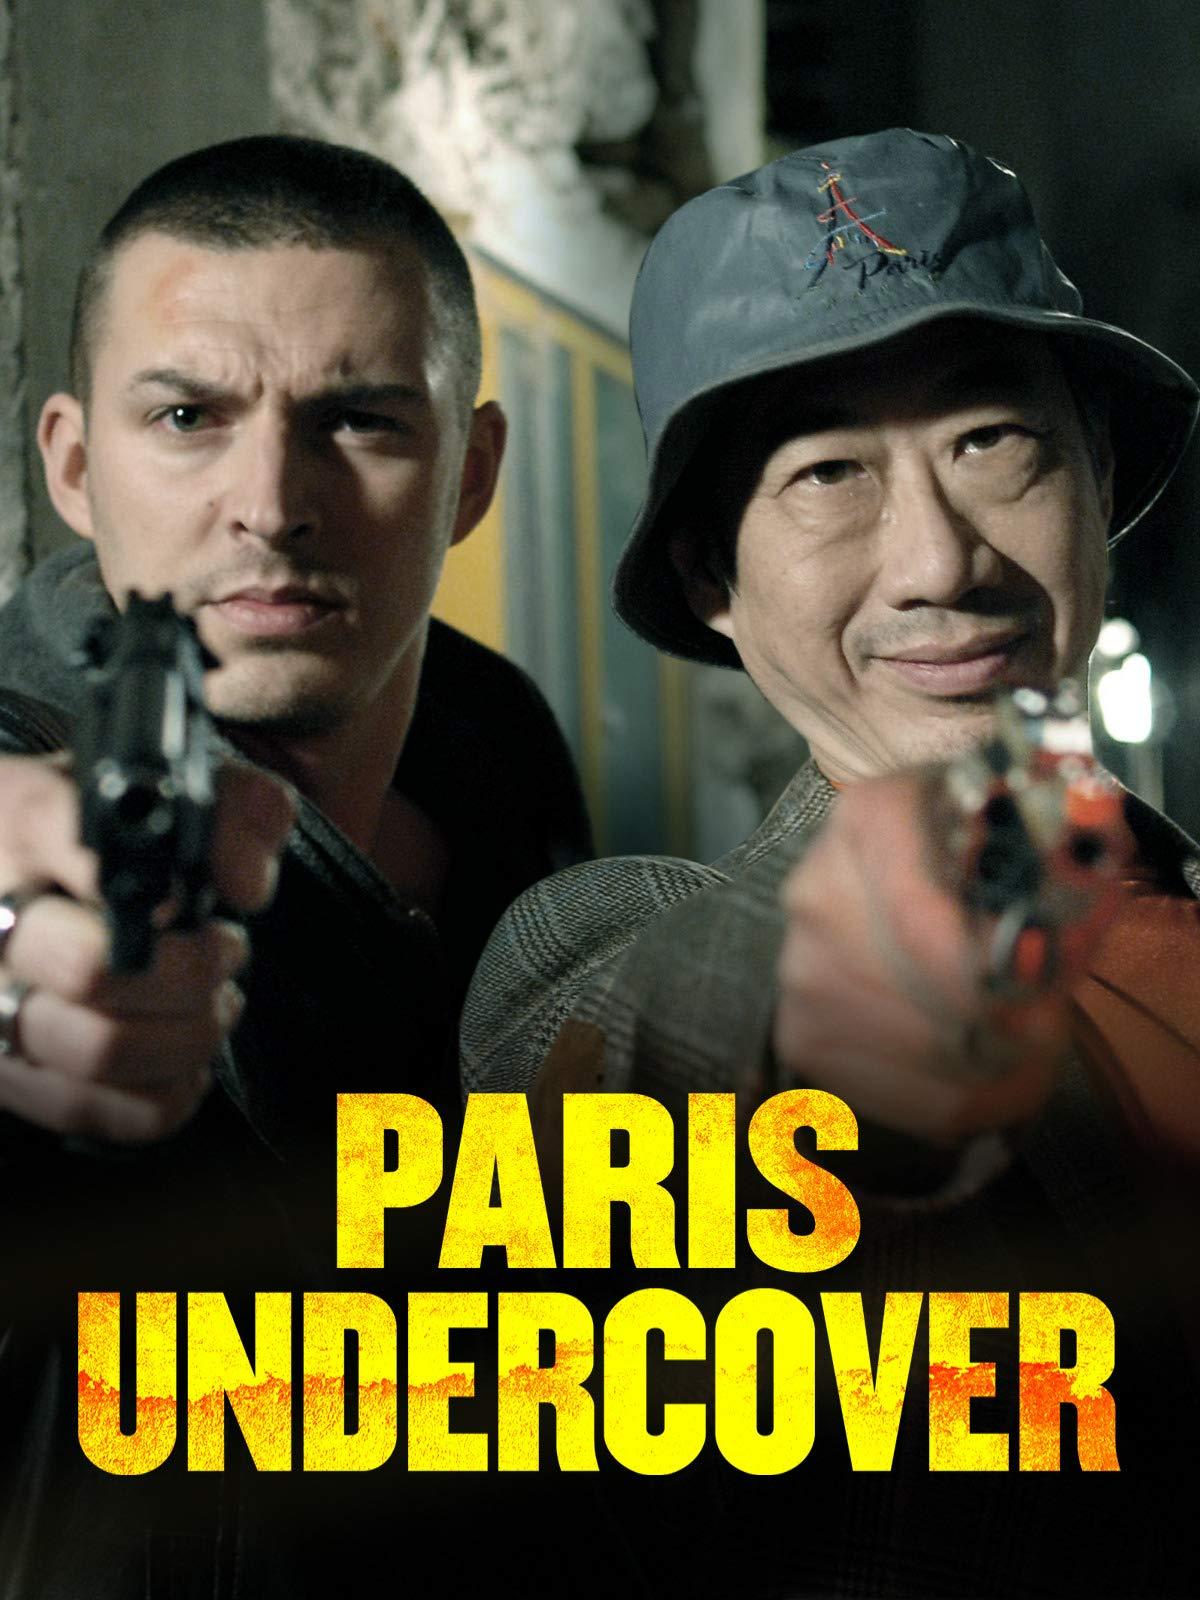 Watch Paris Undercover on Amazon Prime Instant Video UK